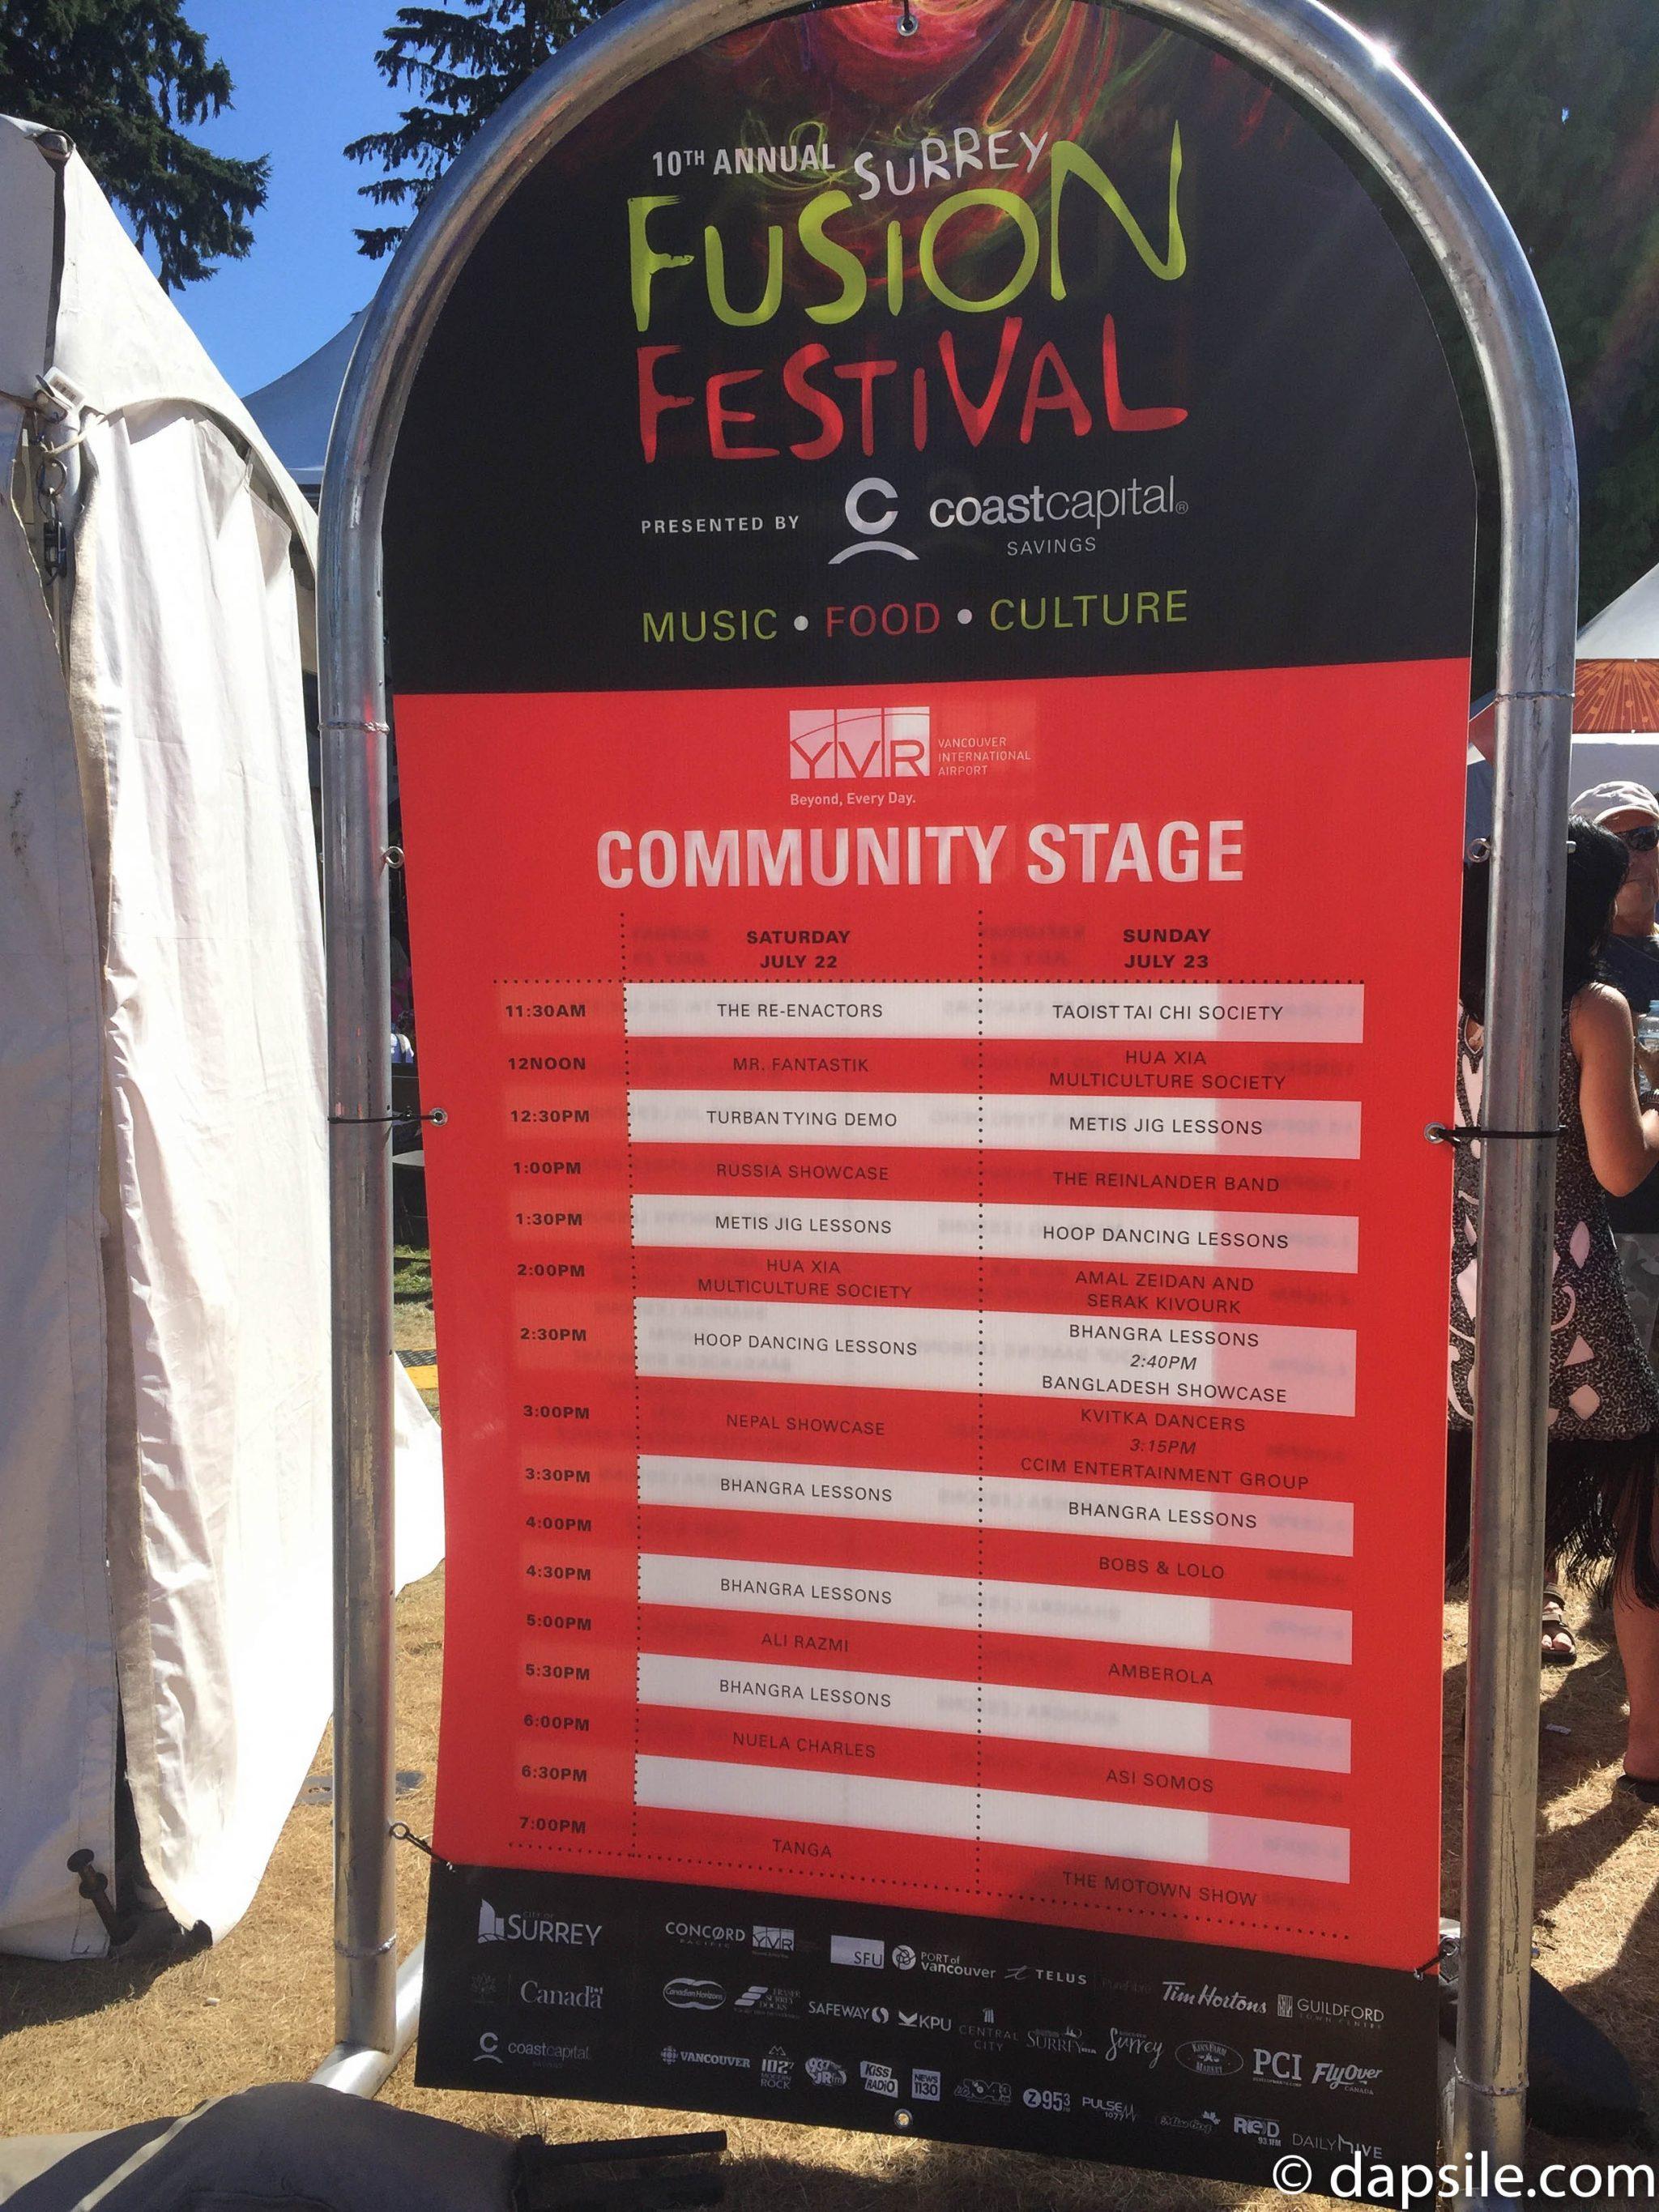 Surrey Fusion Festival 2017 Community Stage Schedule